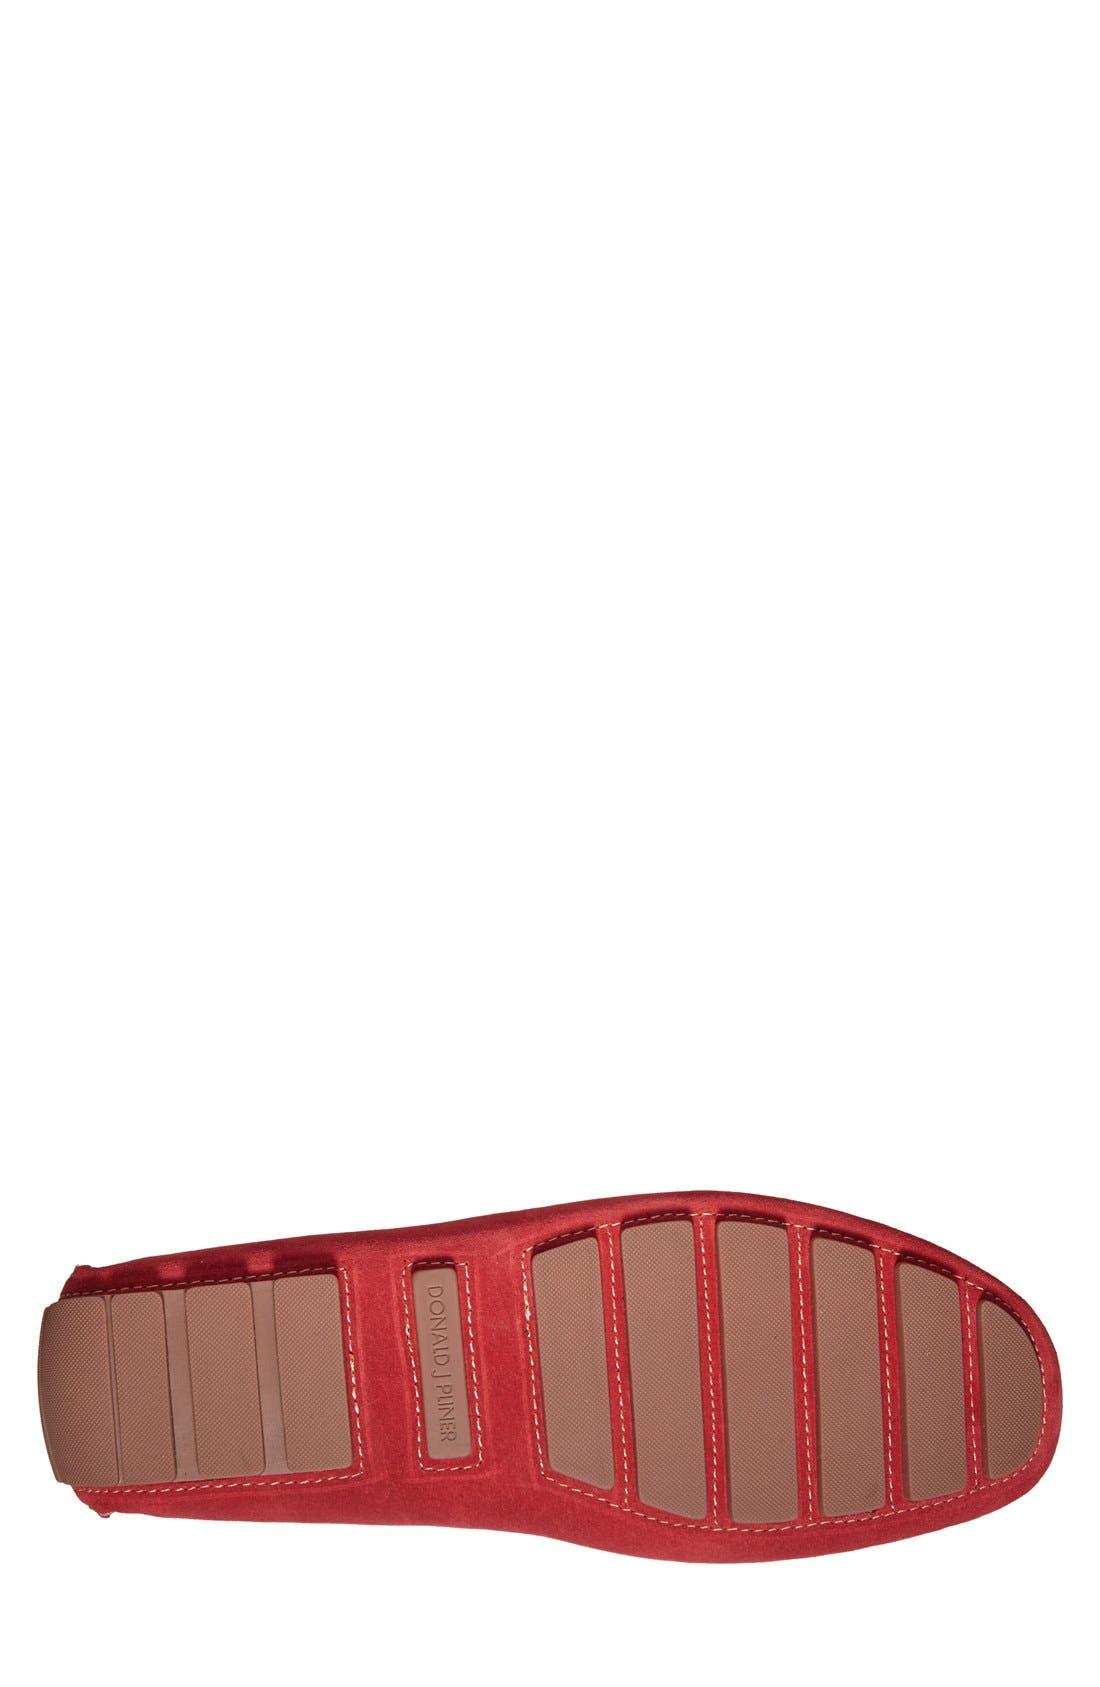 Donald J Pliner 'Derrik' Bit Driving Loafer,                             Alternate thumbnail 40, color,